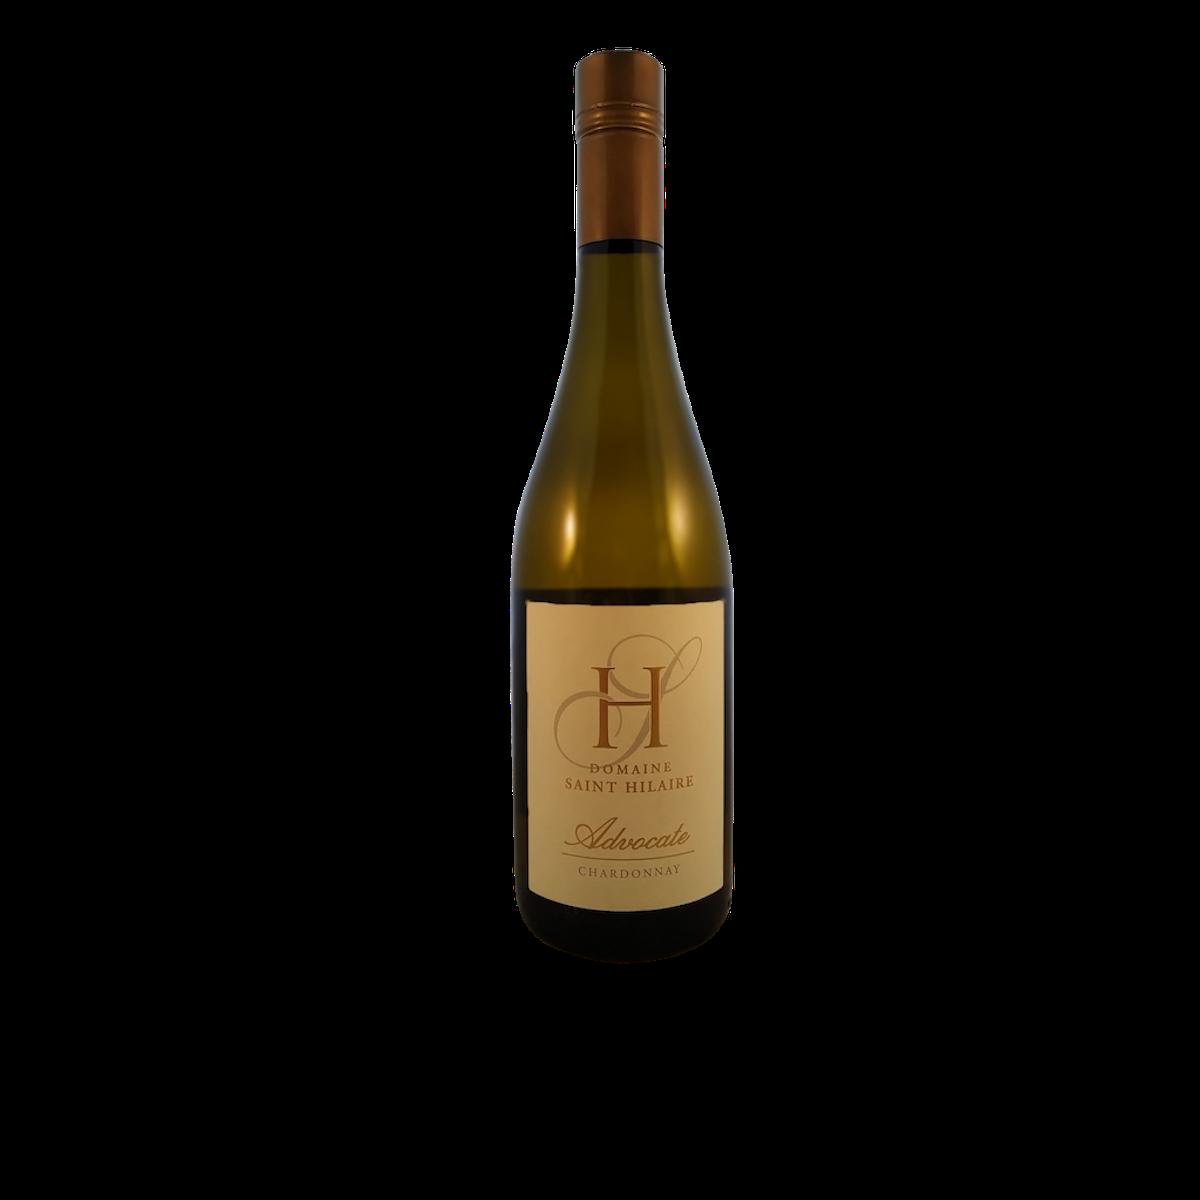 Chardonnay Advocate, 2019